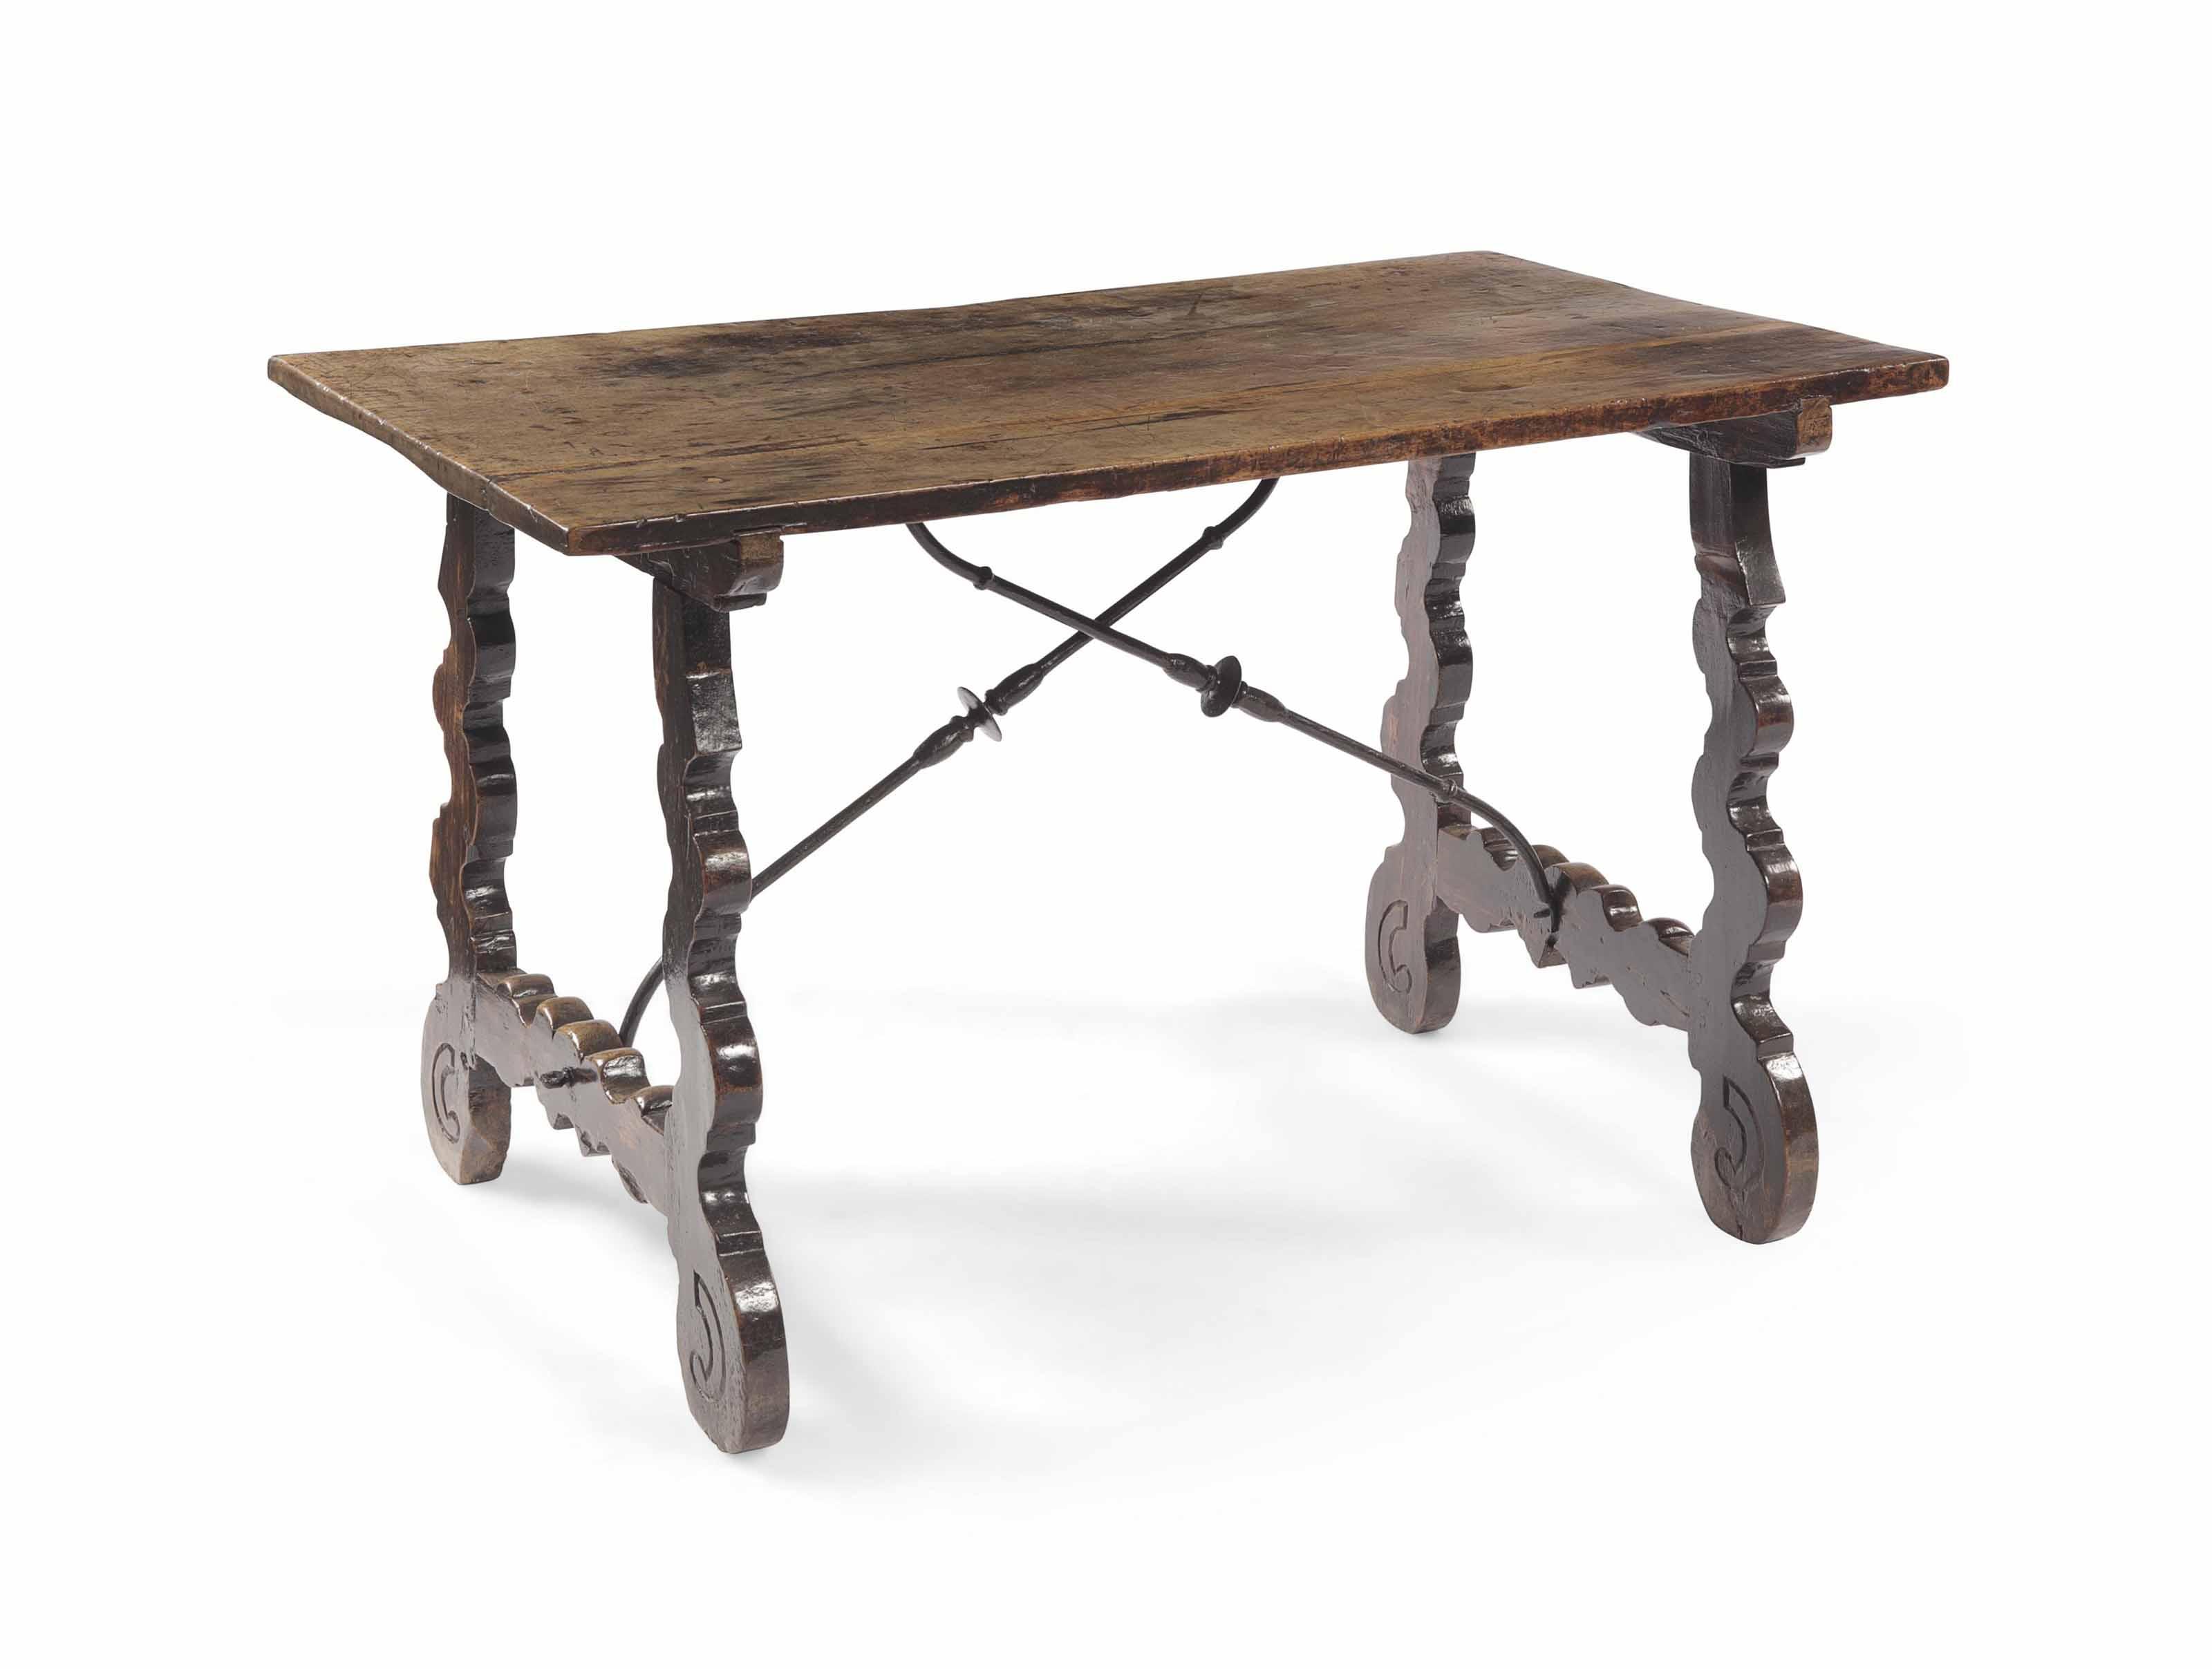 A Spanish walnut refectory table